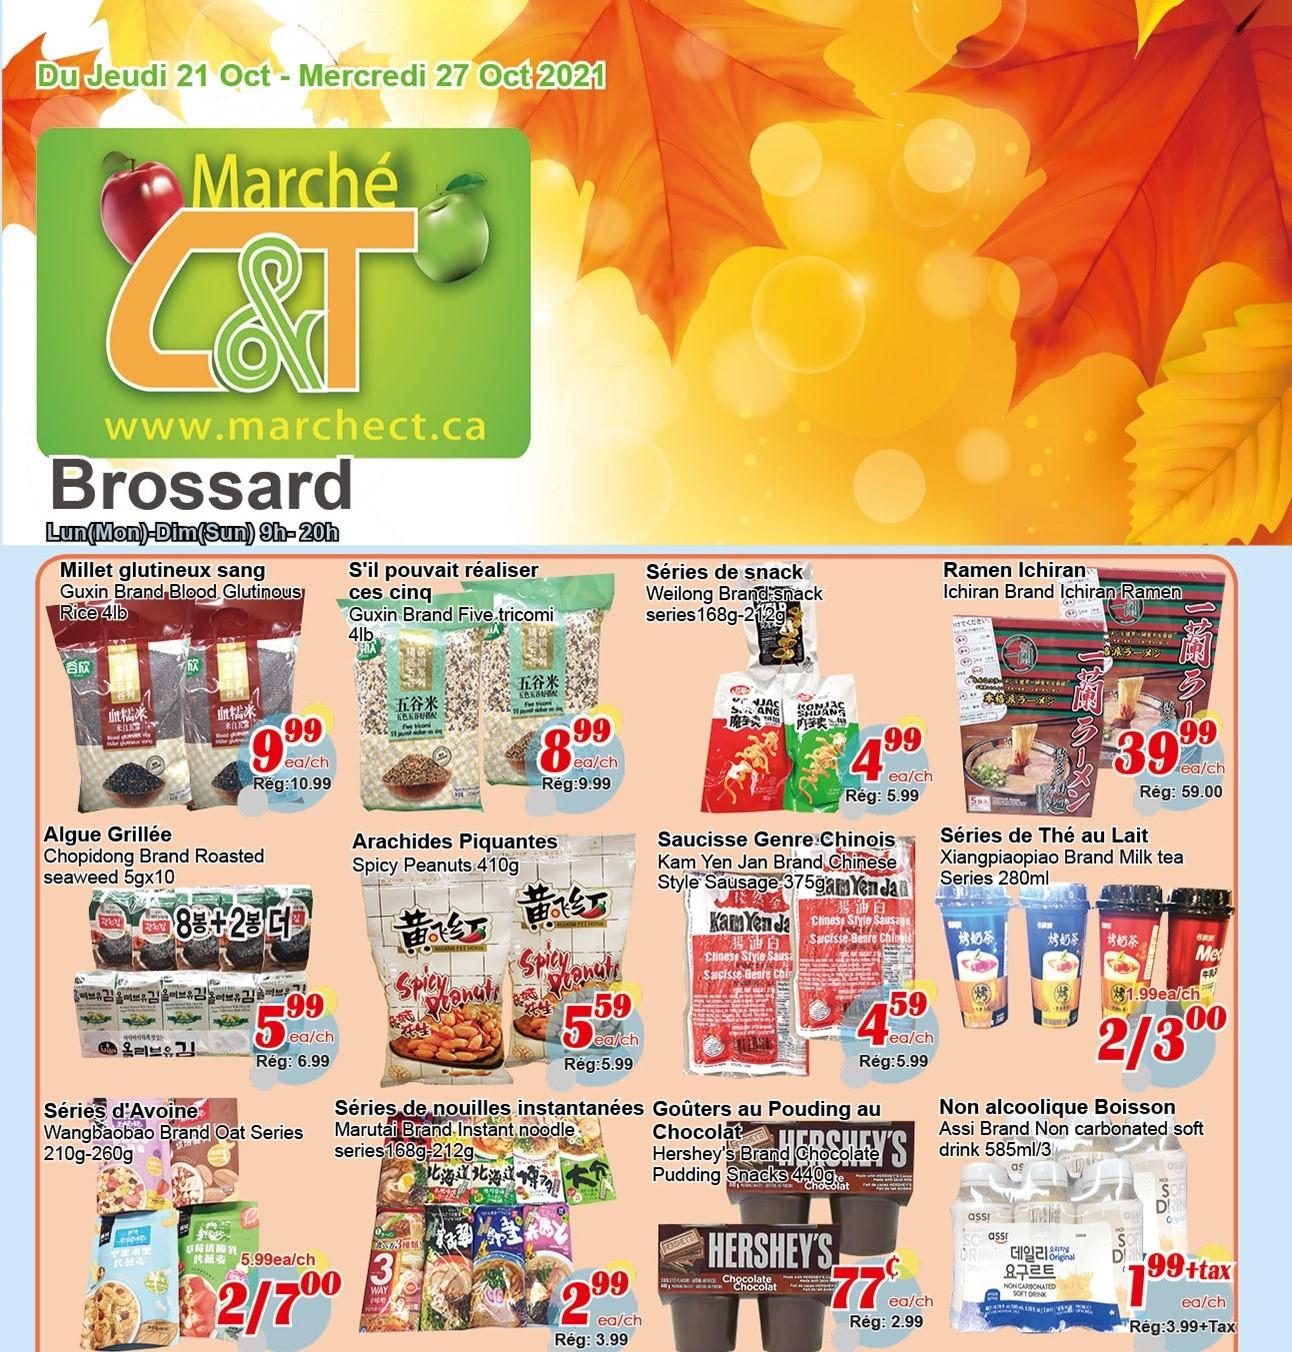 Marché C&T Brossard Flyer | Oct 21